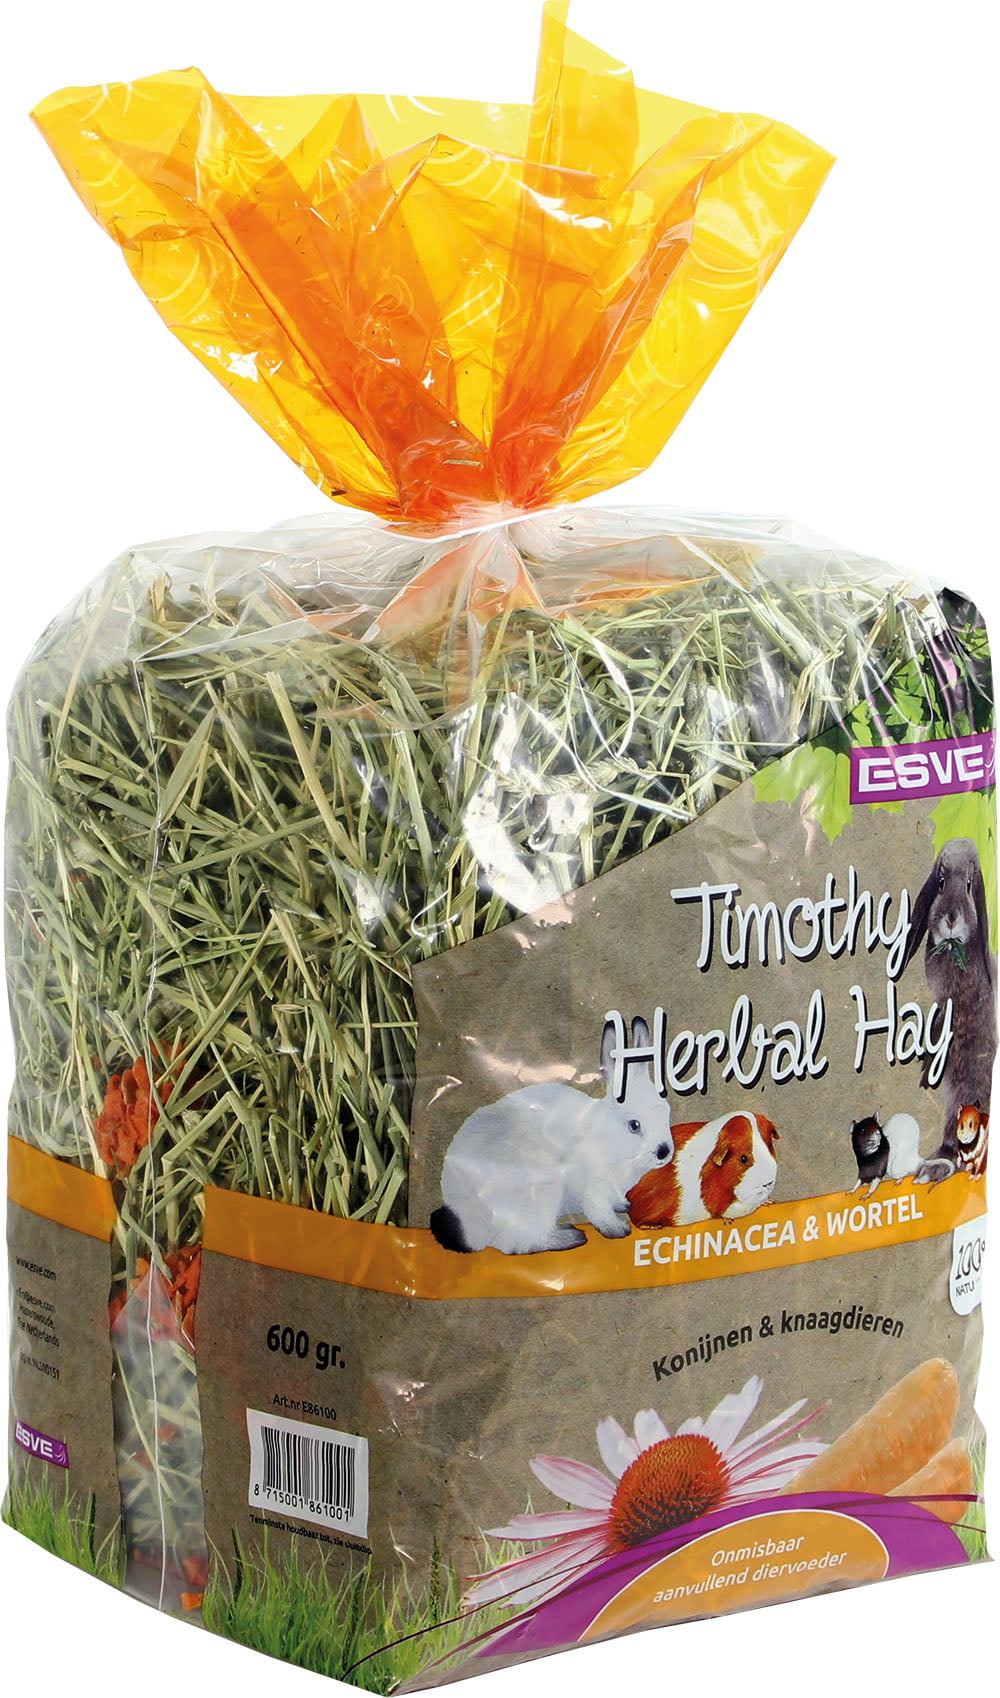 Barn-i Timothy Hay Echinacea&Wortel